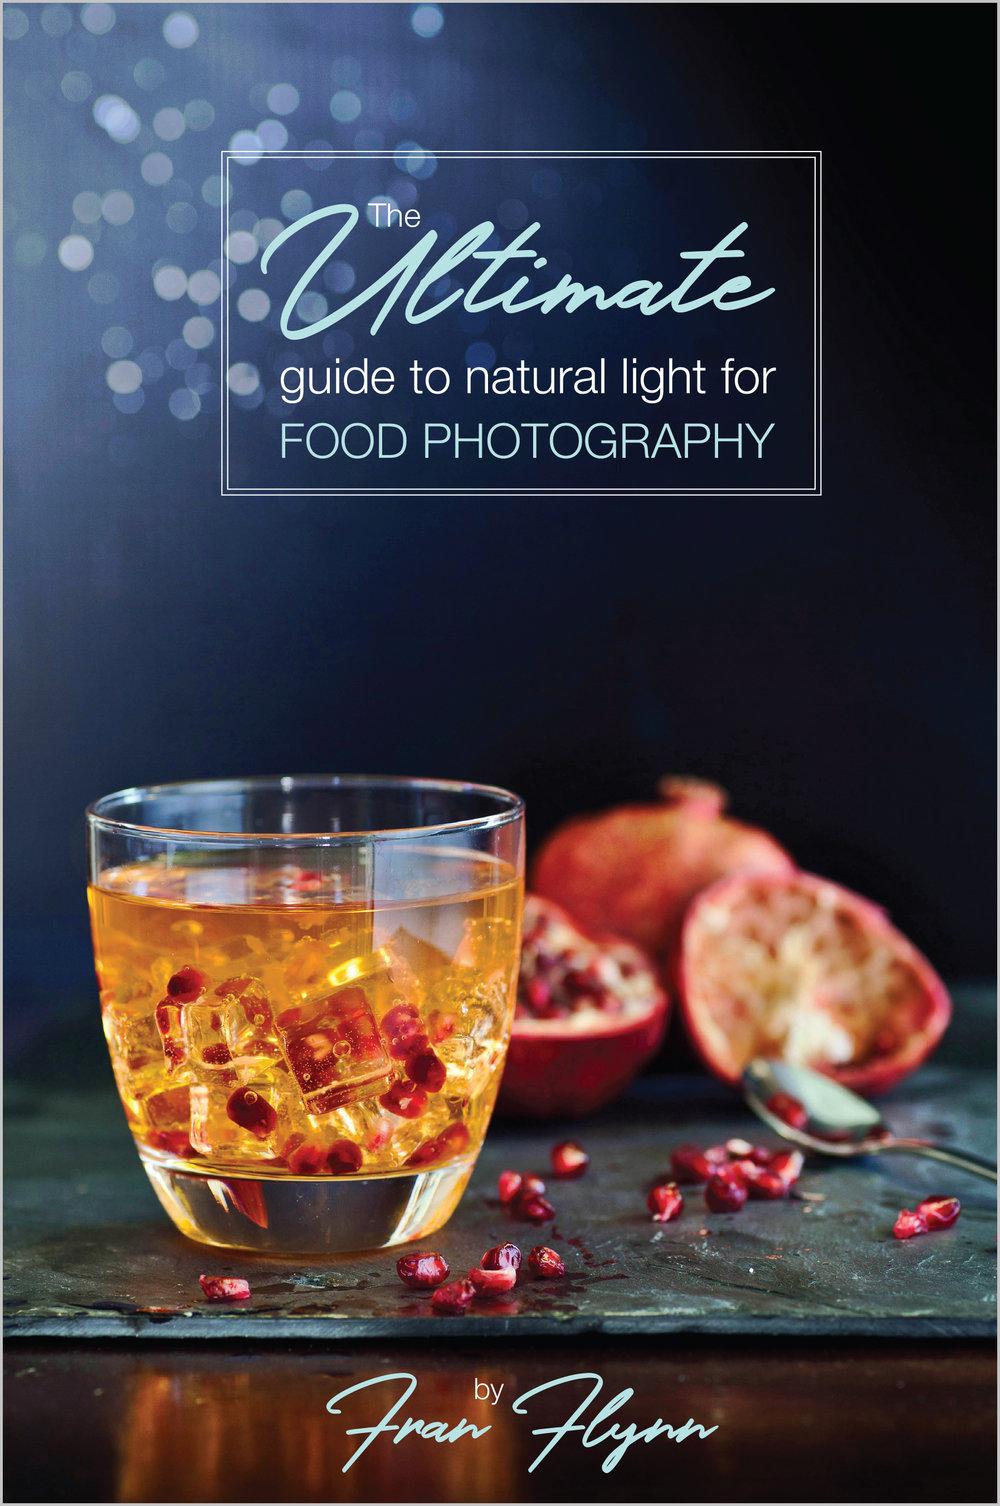 TheUltimateGuideToNaturalLightForFoodPhotographyPrintProof_COVER.jpg